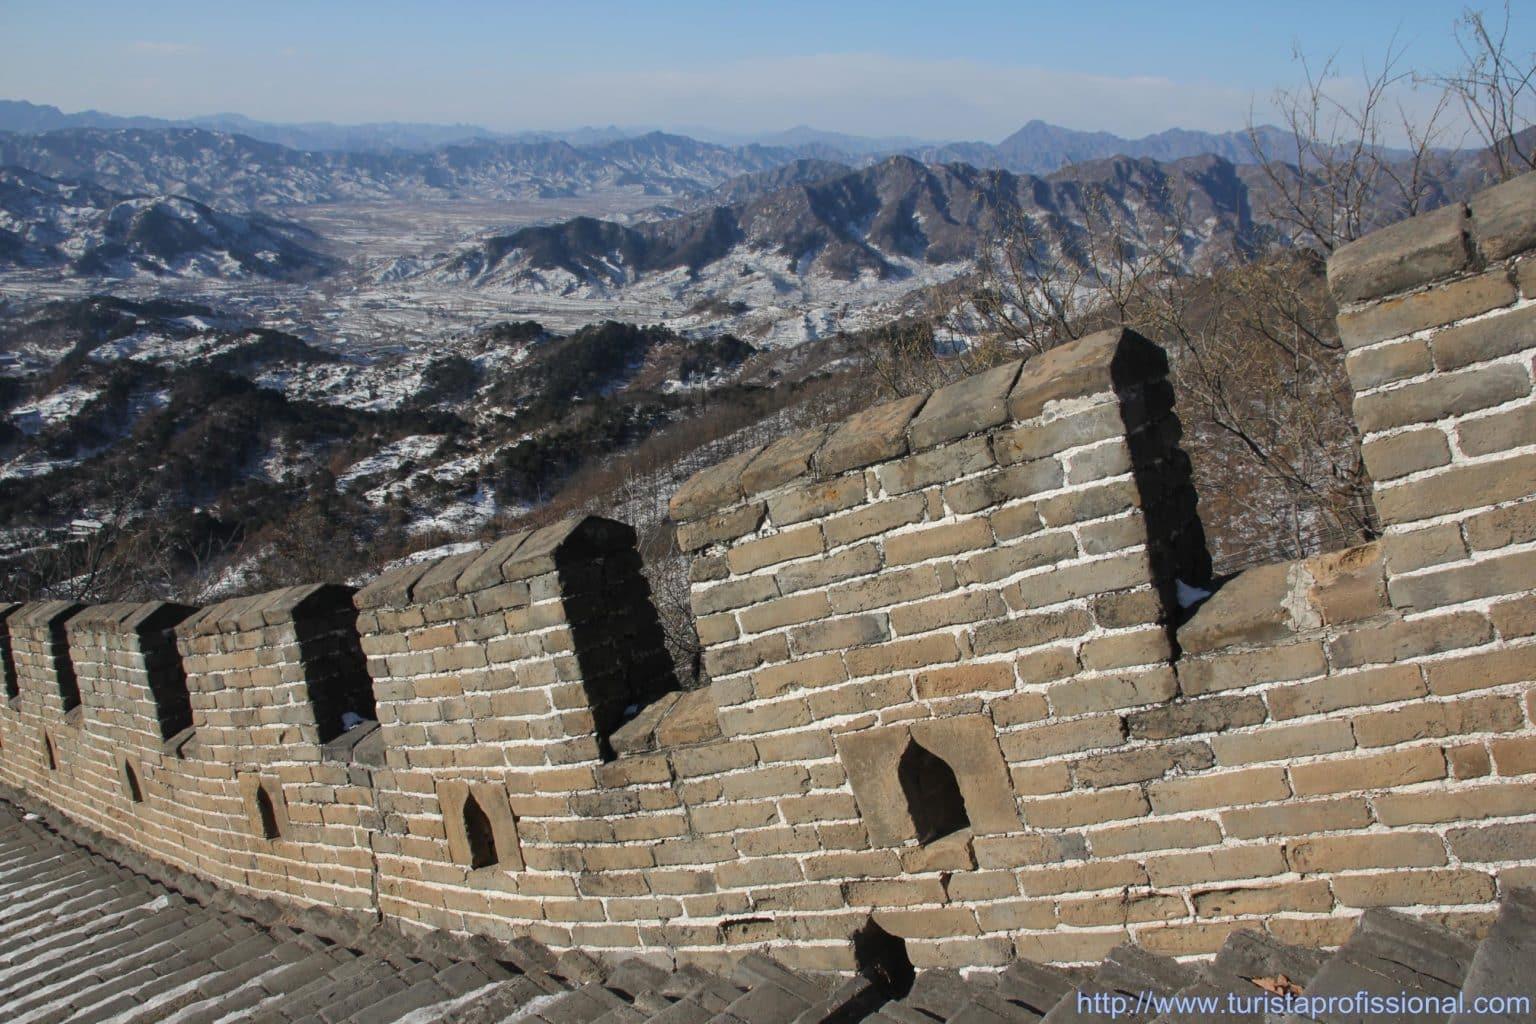 Muralha da China 13 - Olhares | Muralha da China